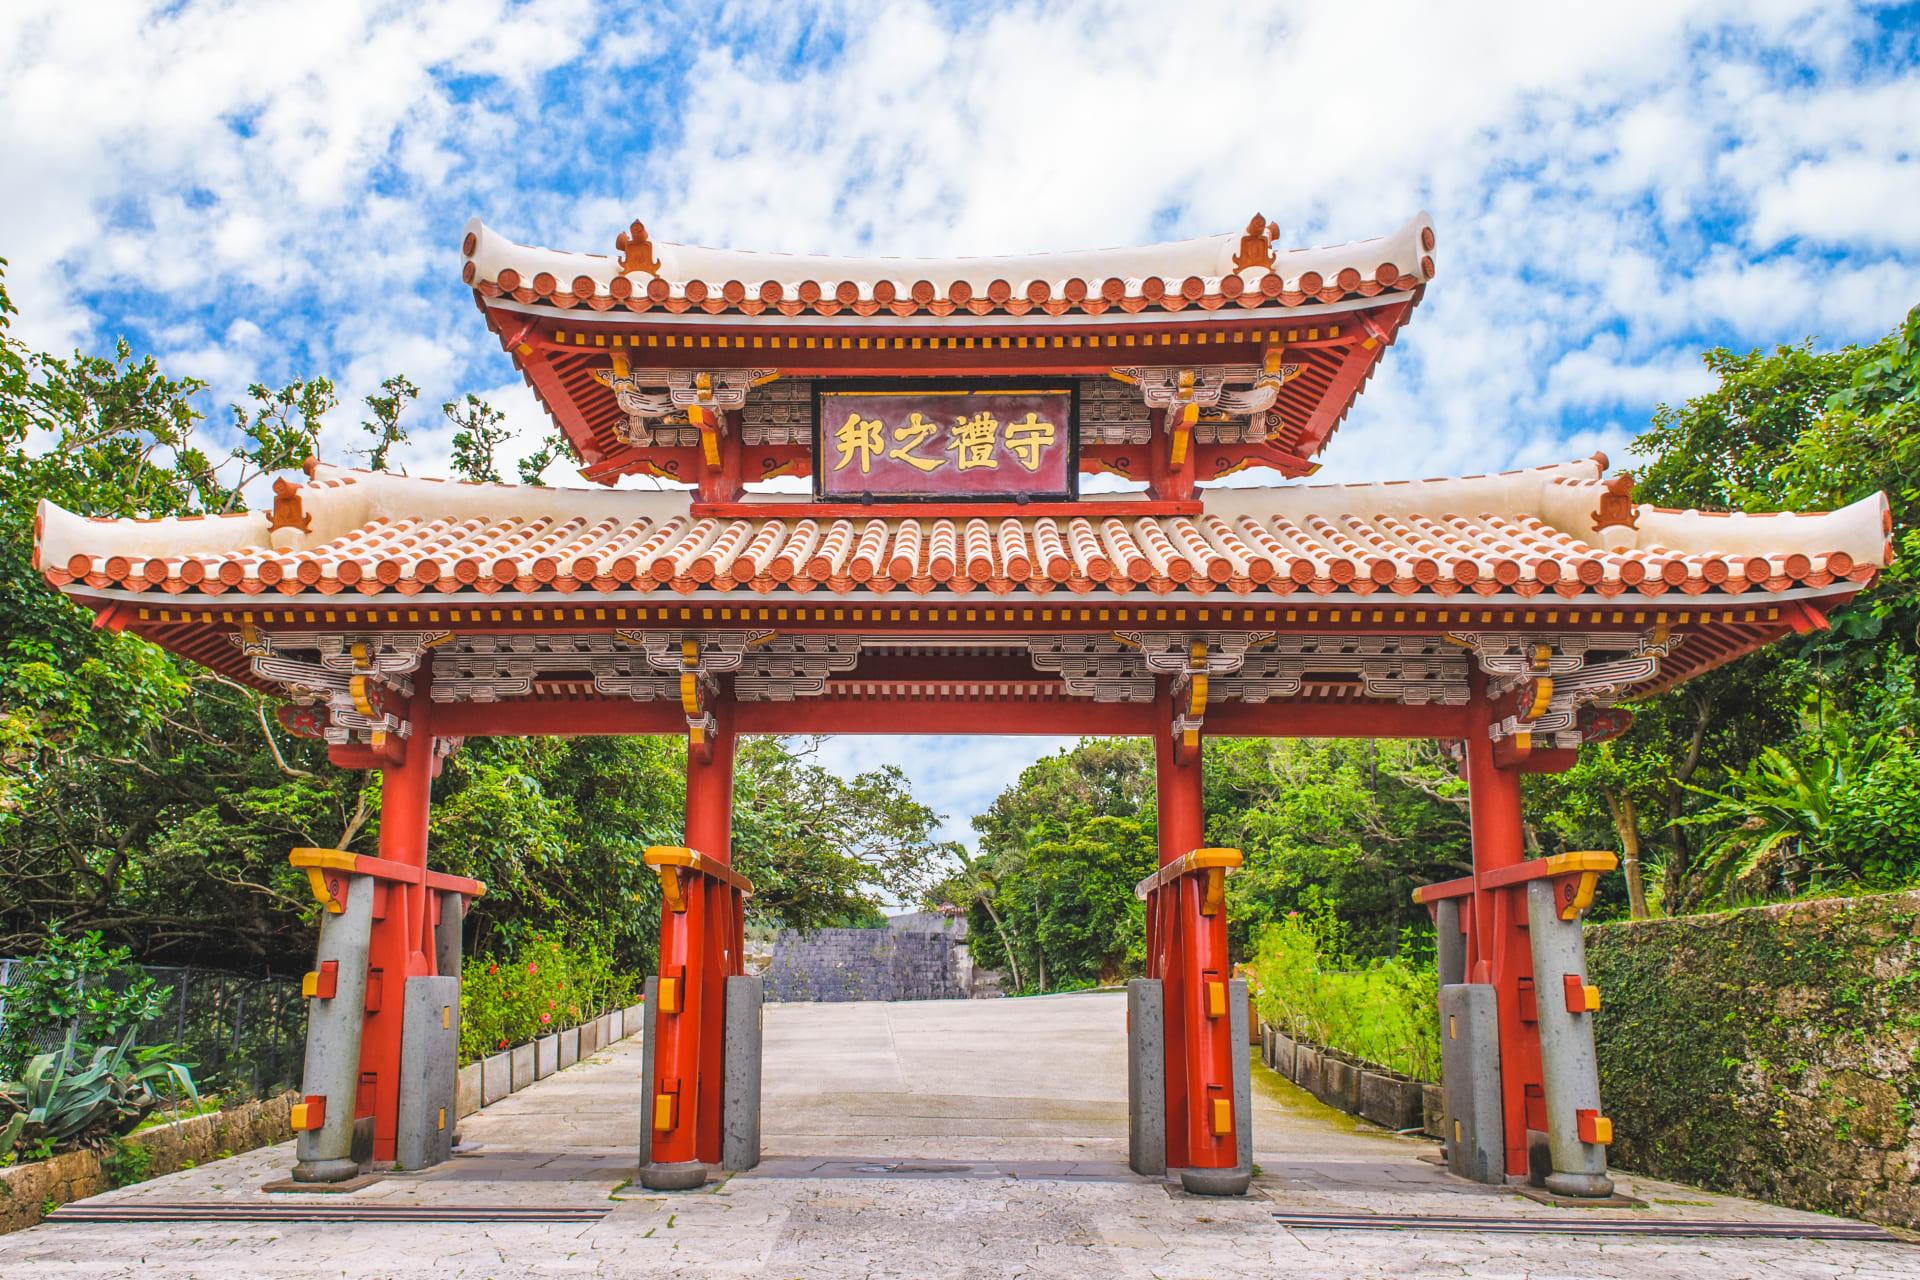 Okinawa - Shuri Castle: Legacy of the Ryukyu Kings